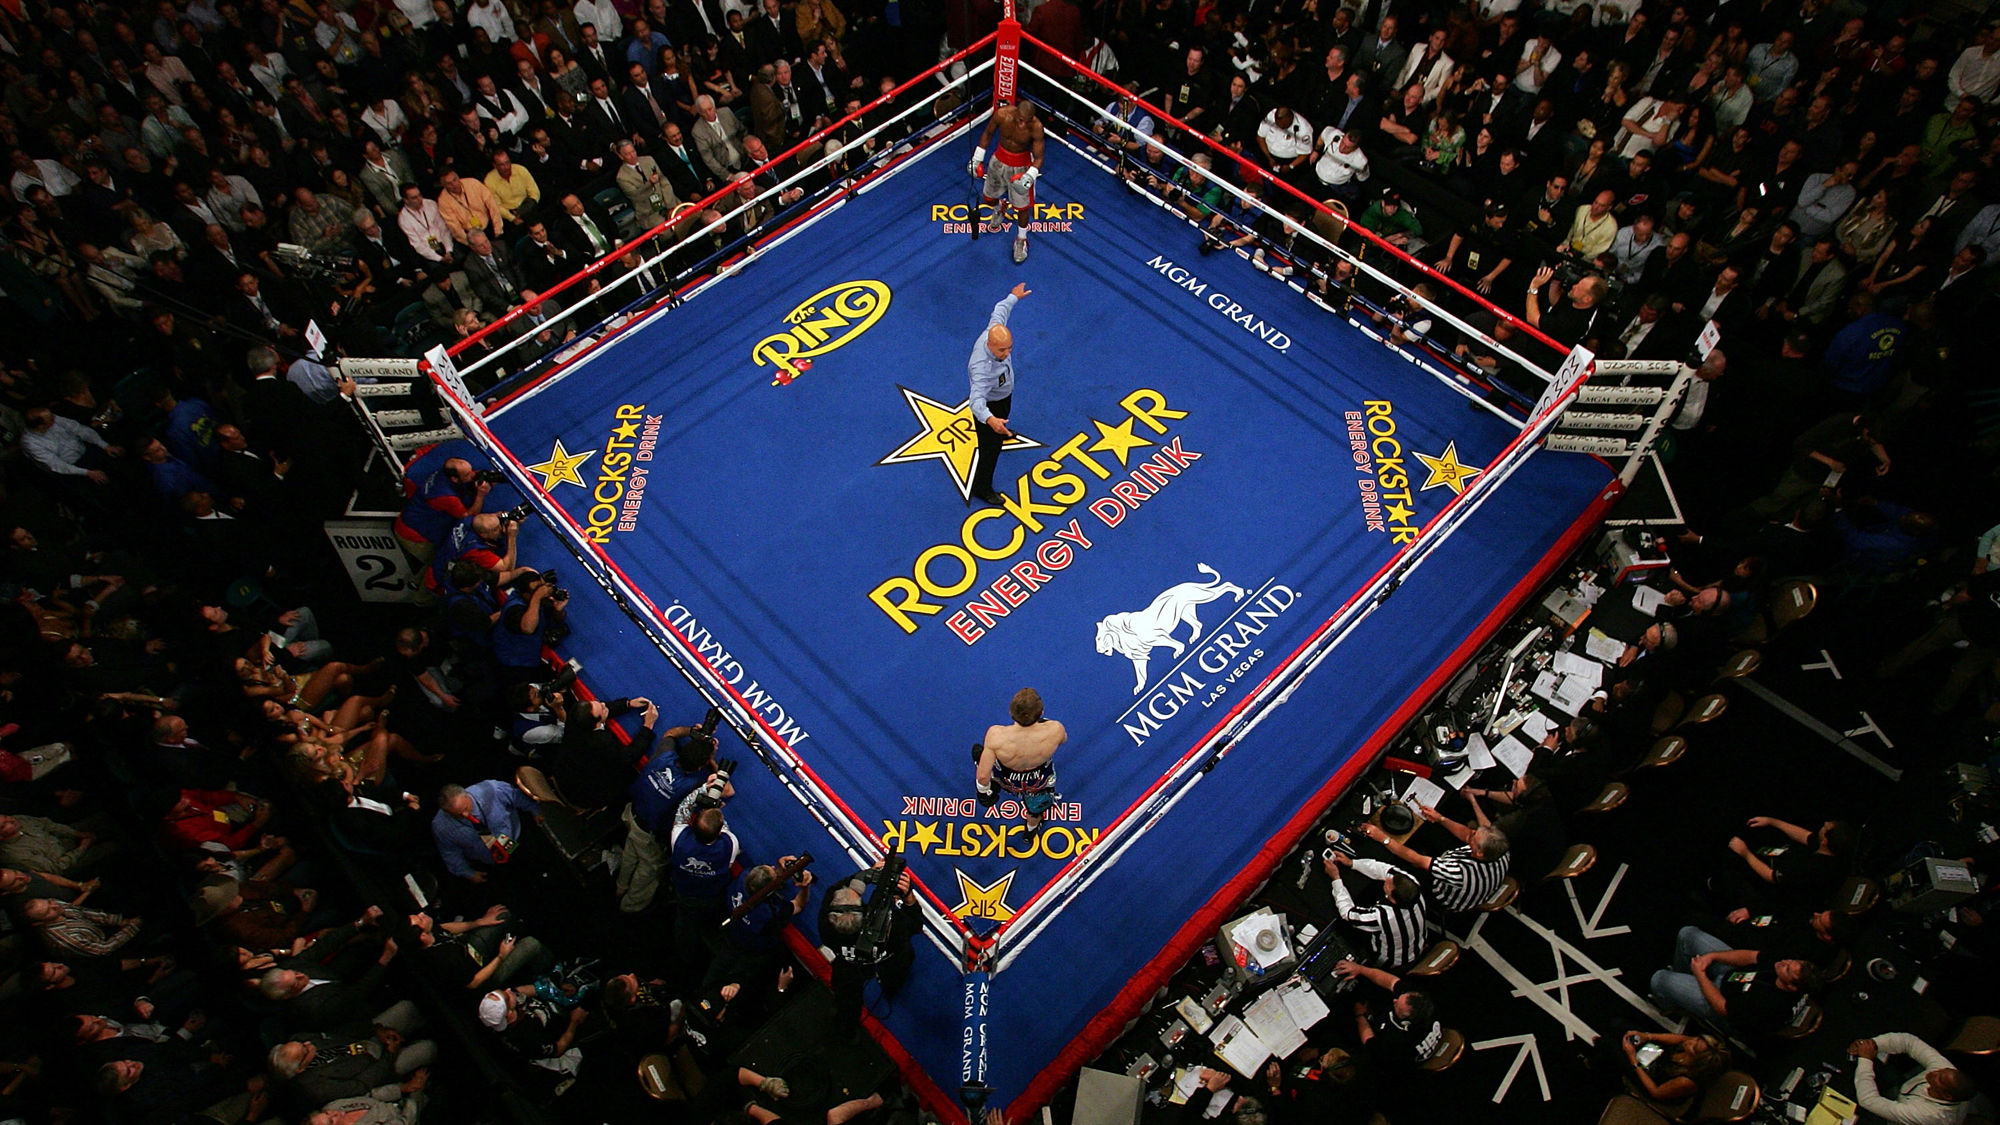 World Welterweight Championship – Floyd Mayweather Jr. v Ricky Hatton